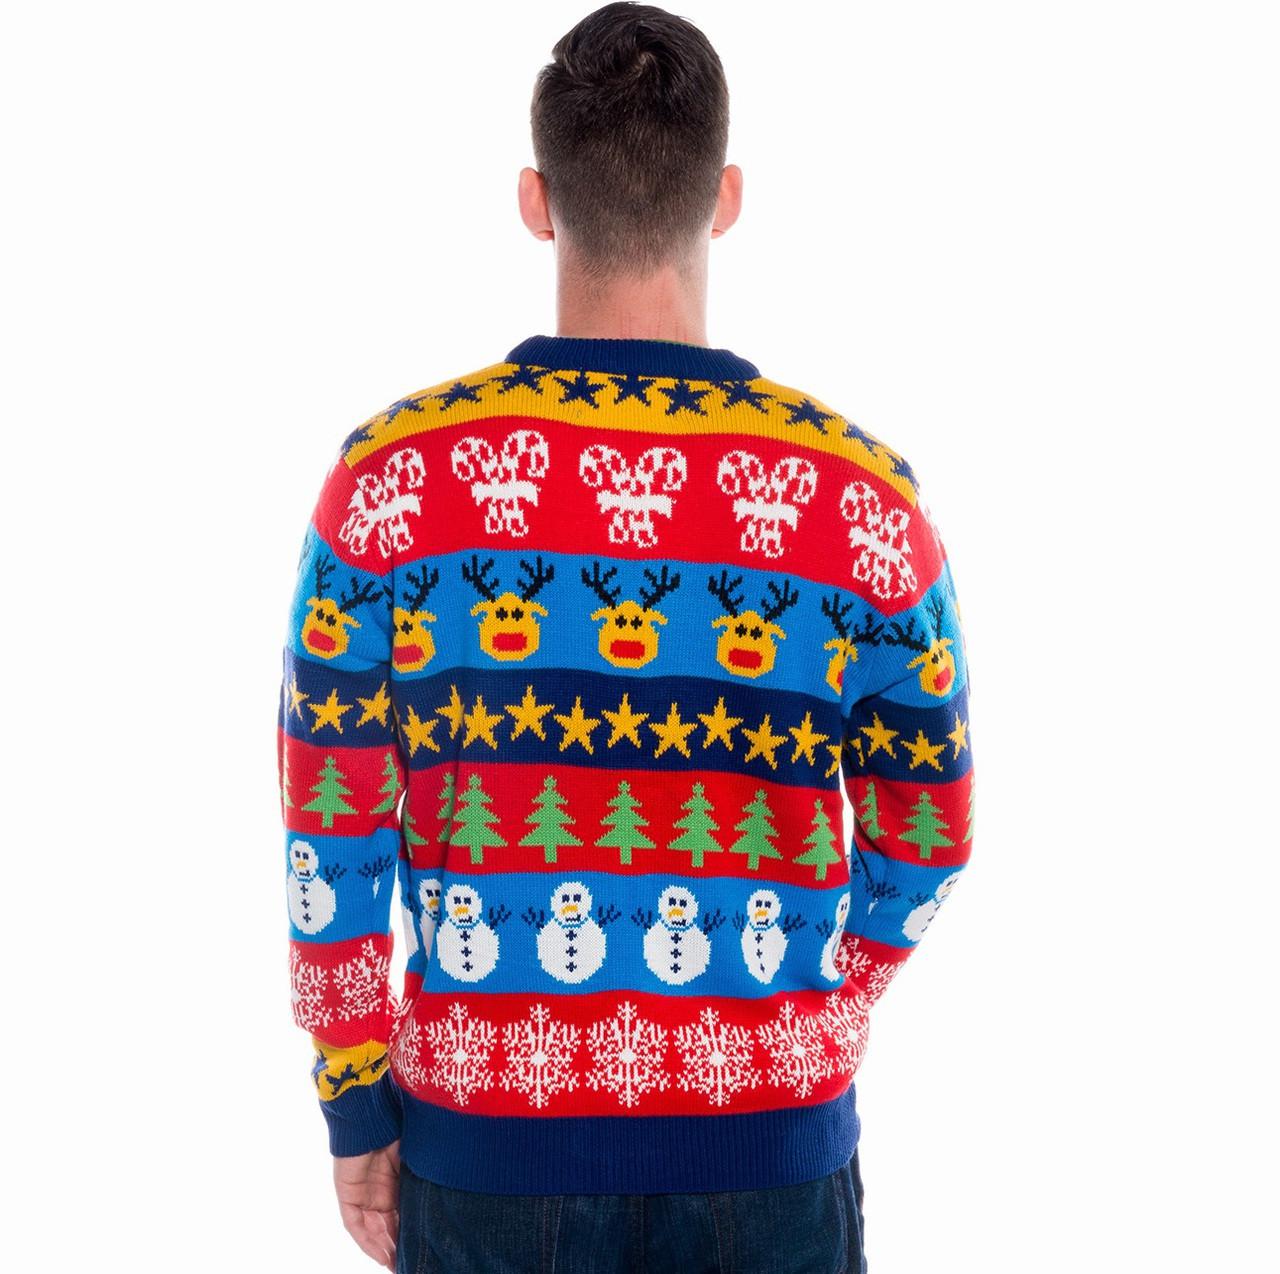 Christmas sweater uk